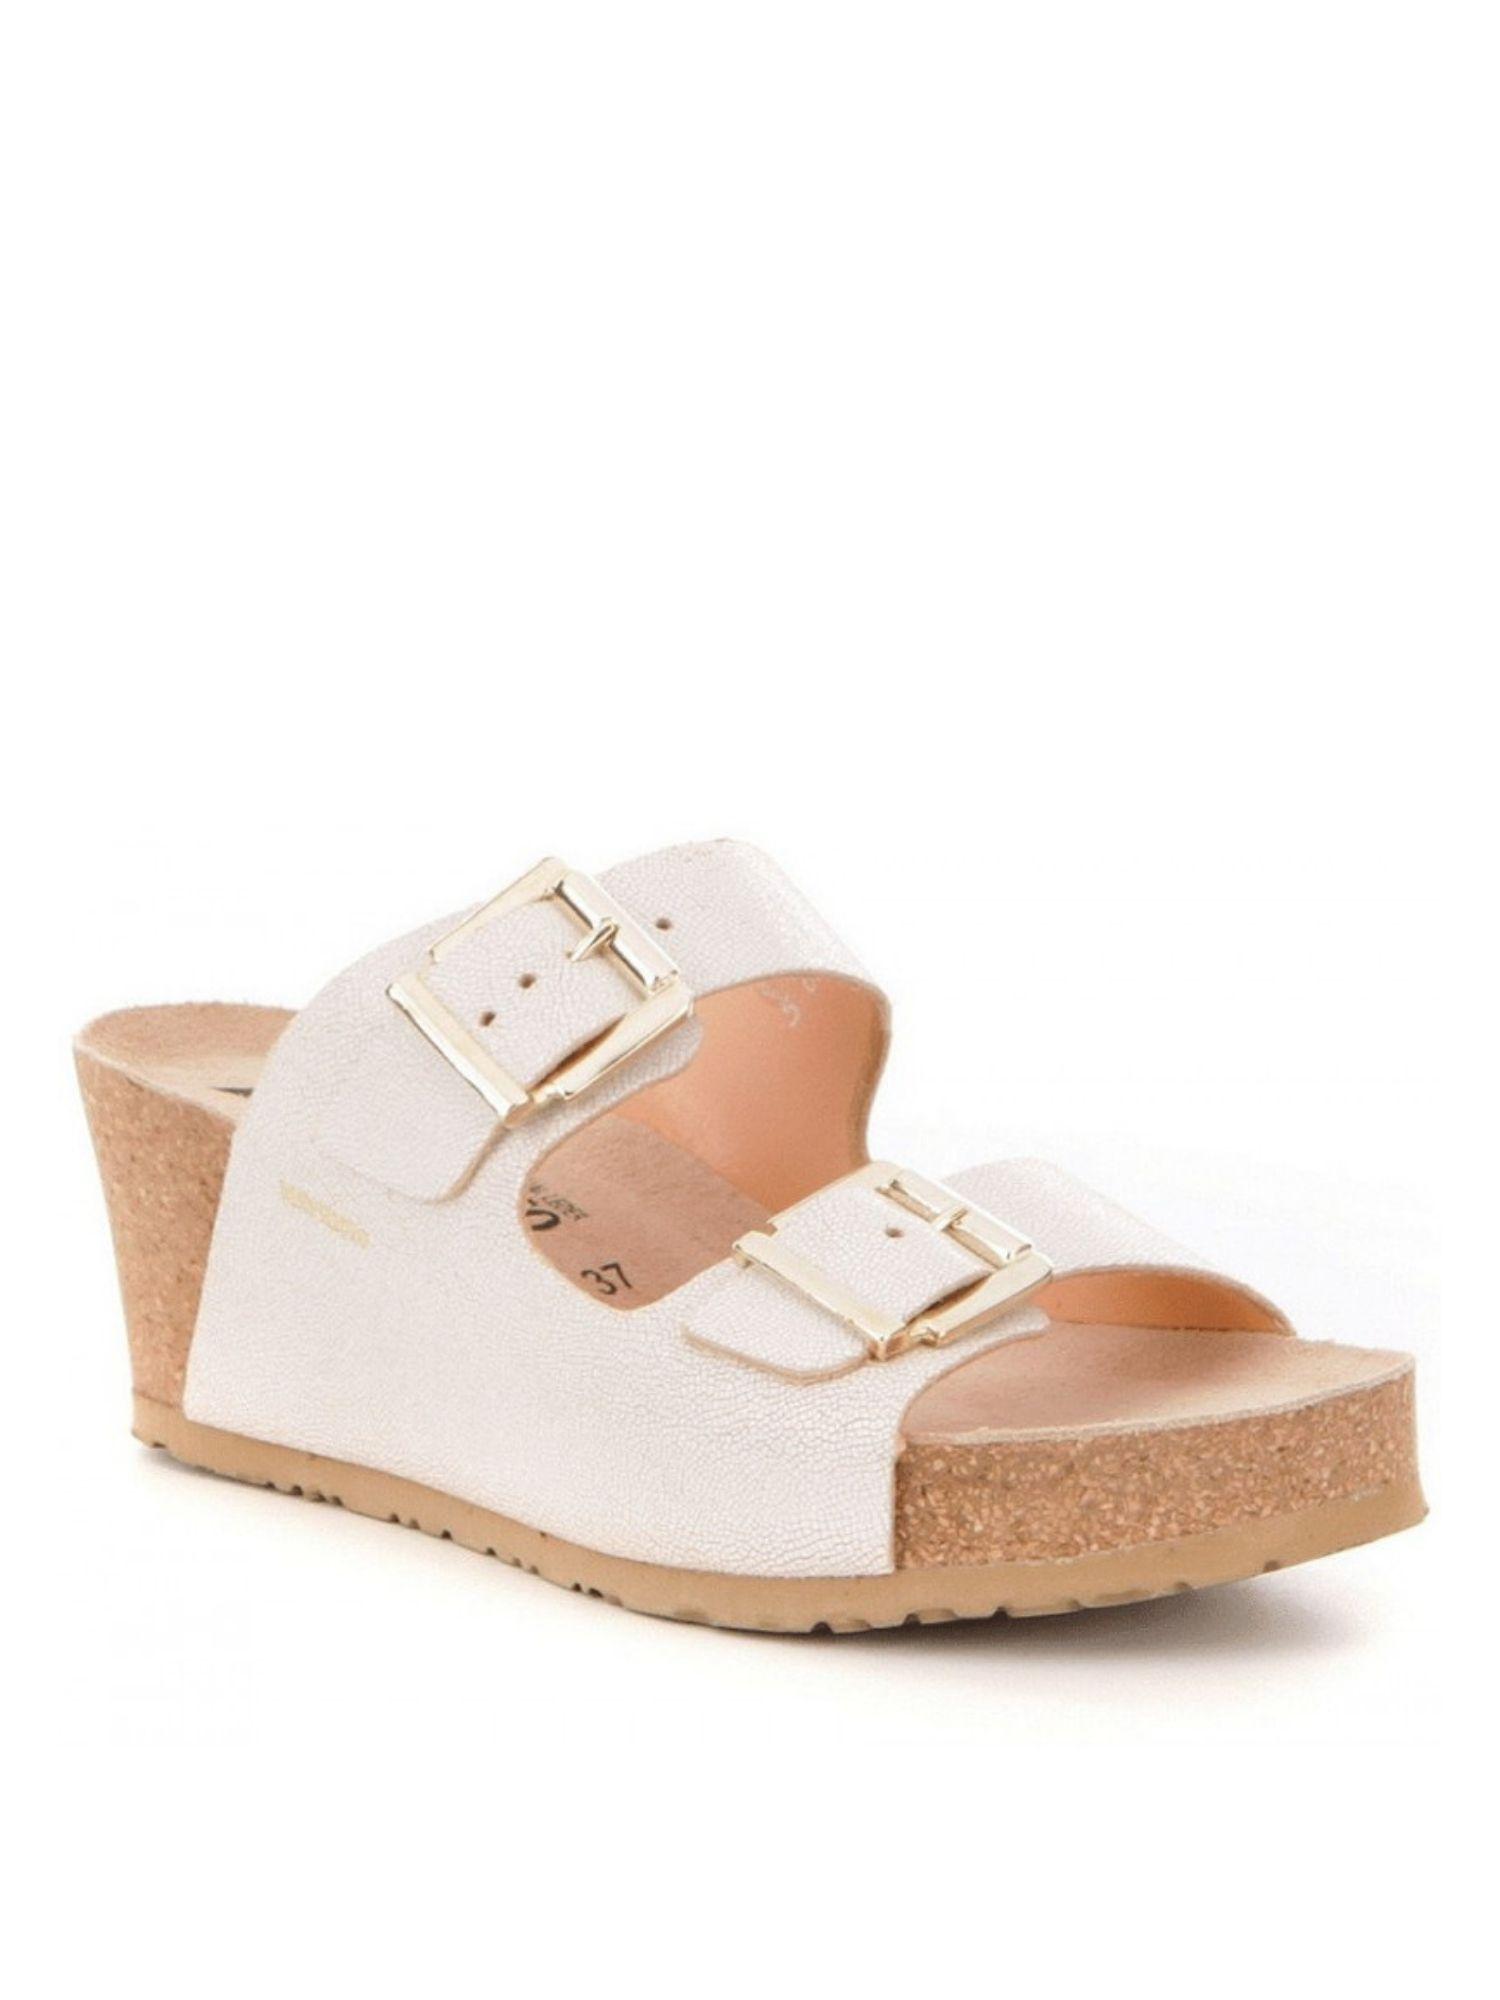 Sandalo Mephisto Lenia Bianco